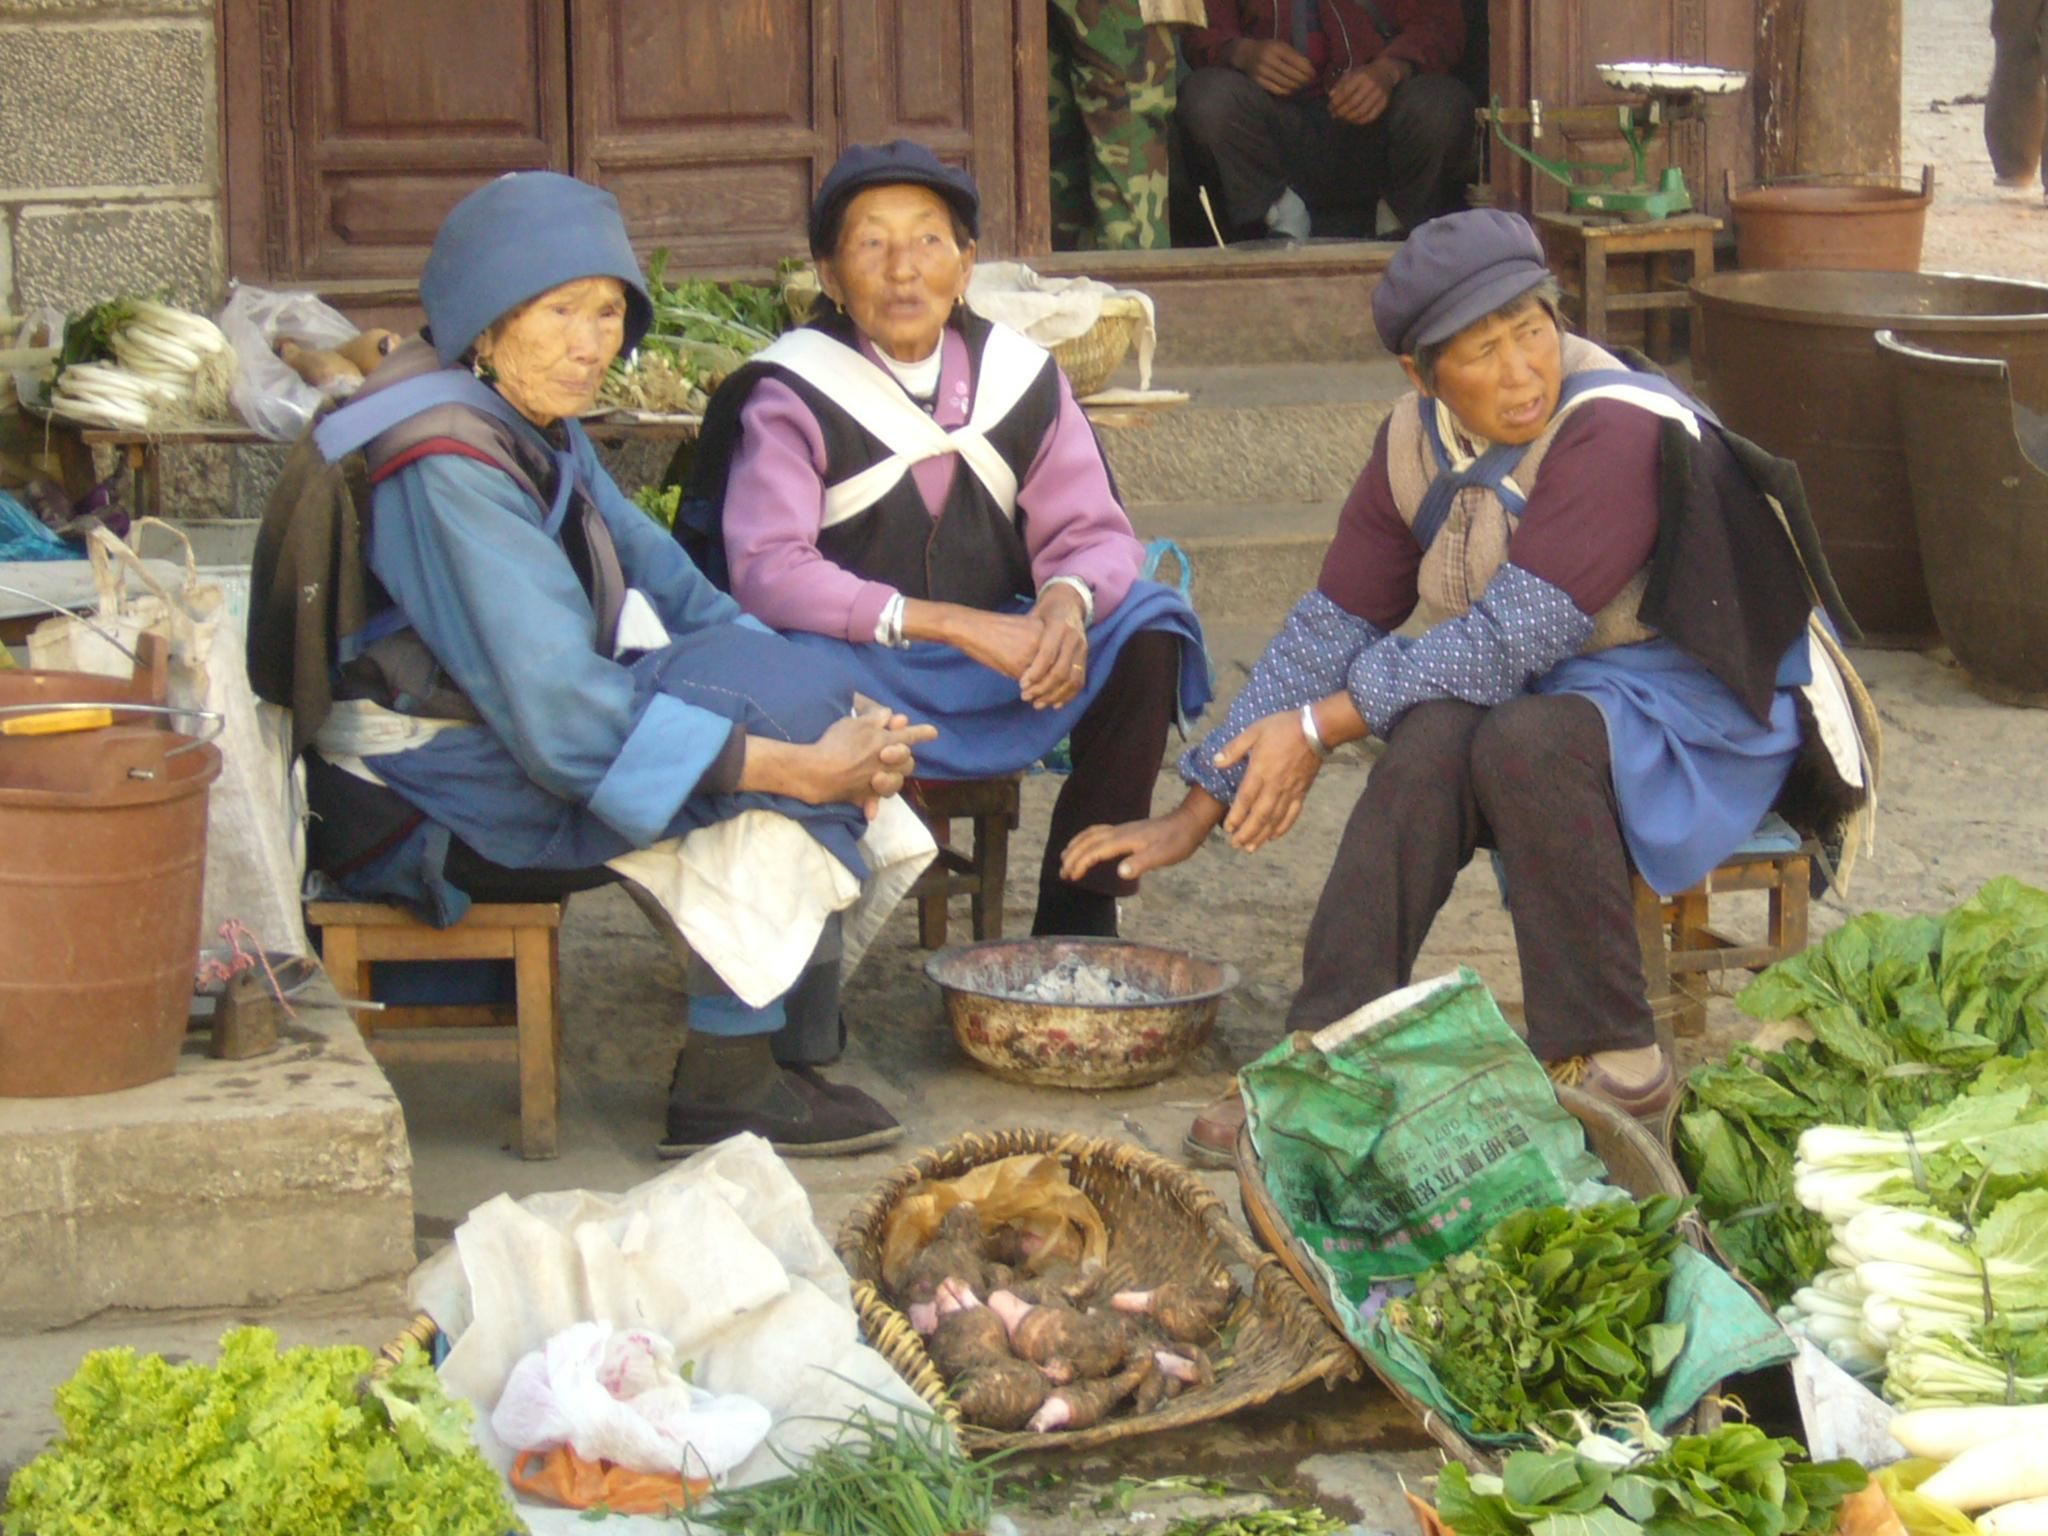 Voyage sur-mesure, Vanessa partage ses anecdotes sur la culture chinoise !